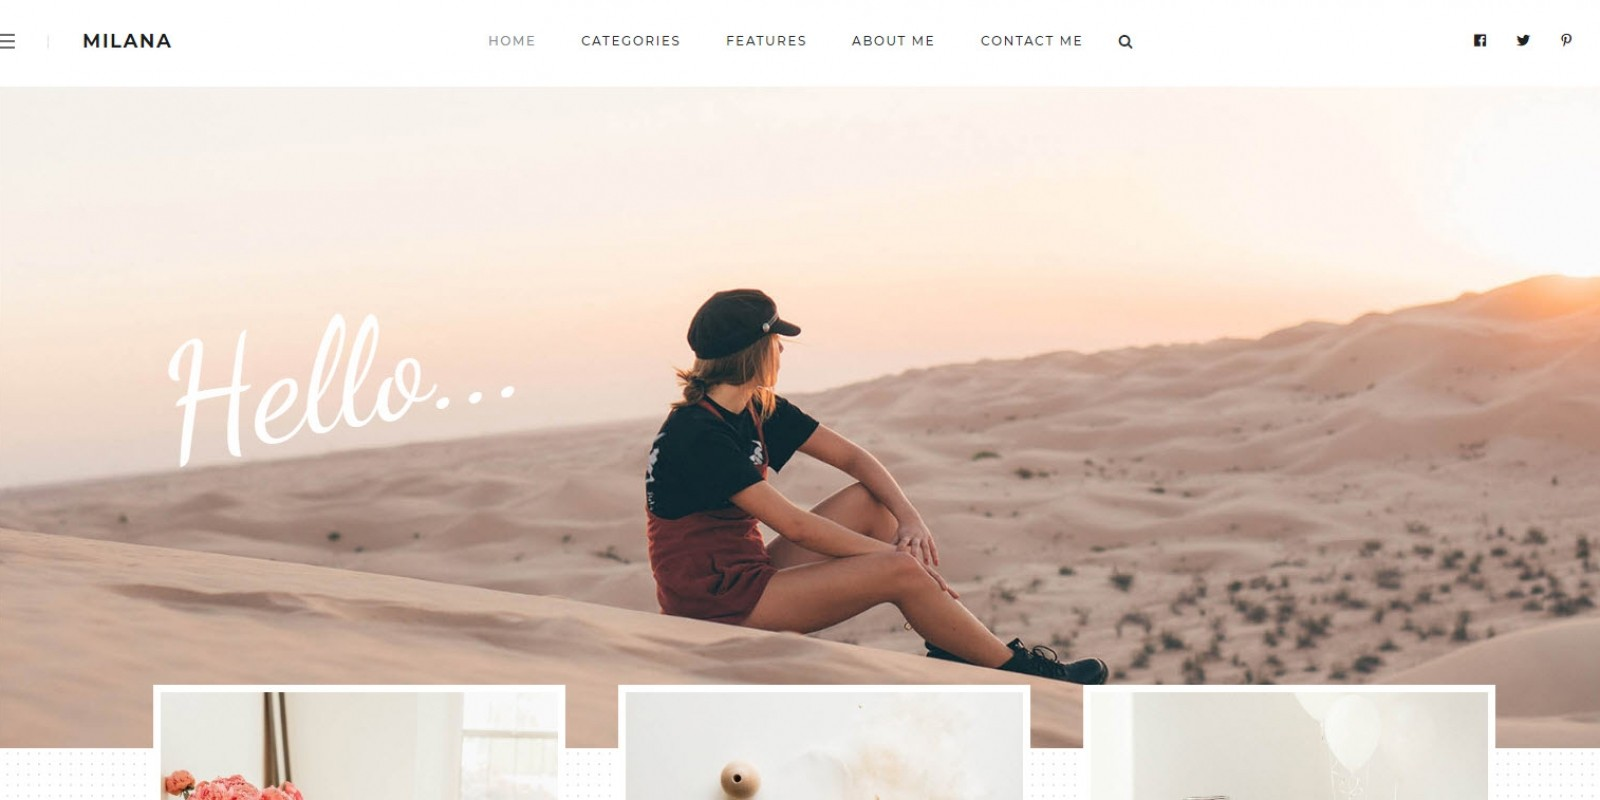 Milana - Personal WordPress Blog Theme